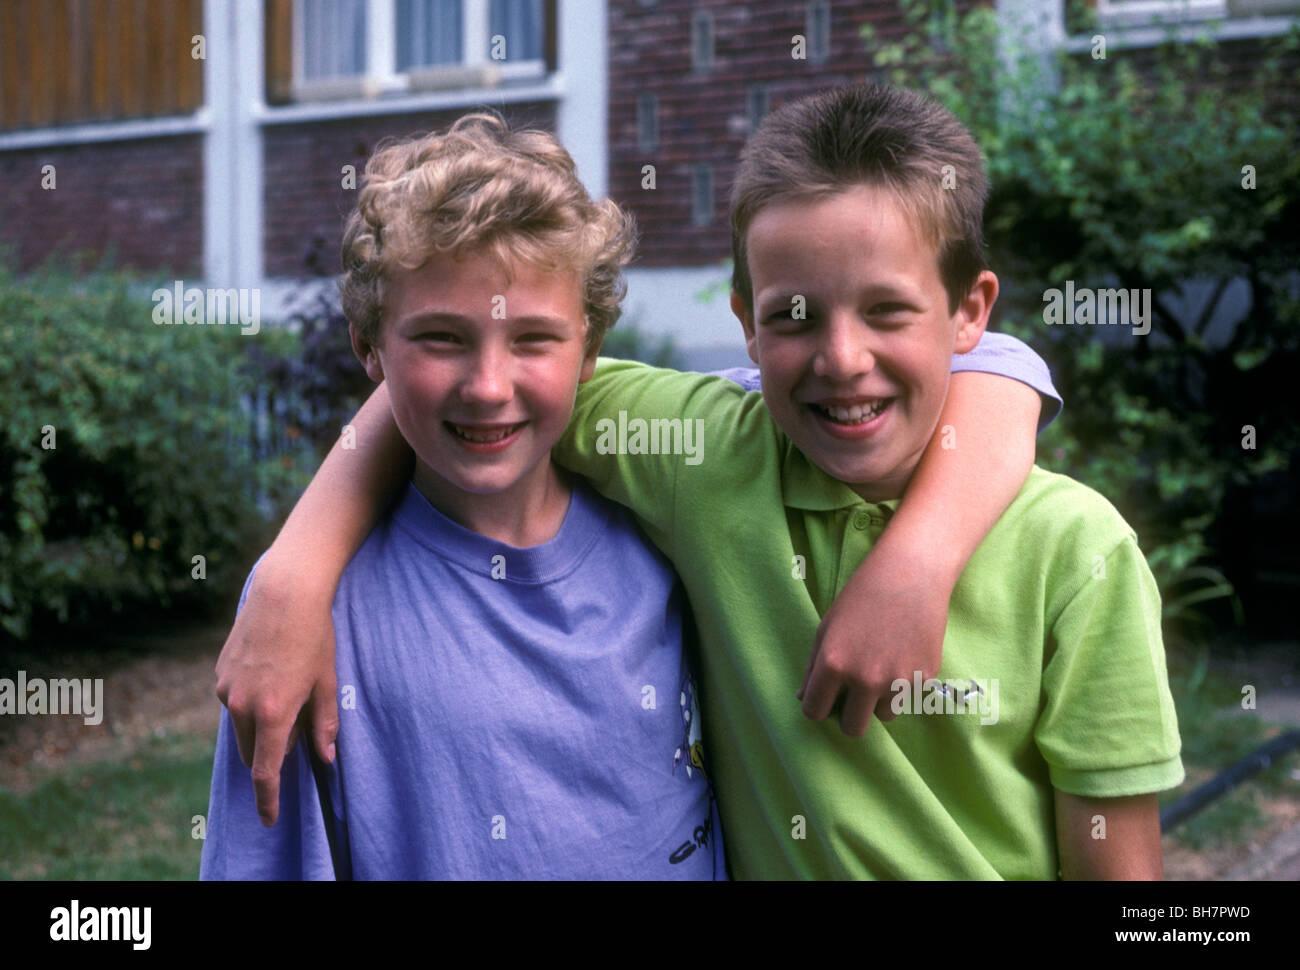 2 French boys, two French boys, French boys, French, boys, good friends, best friends, Verneuil-sur-Seine, France, - Stock Image